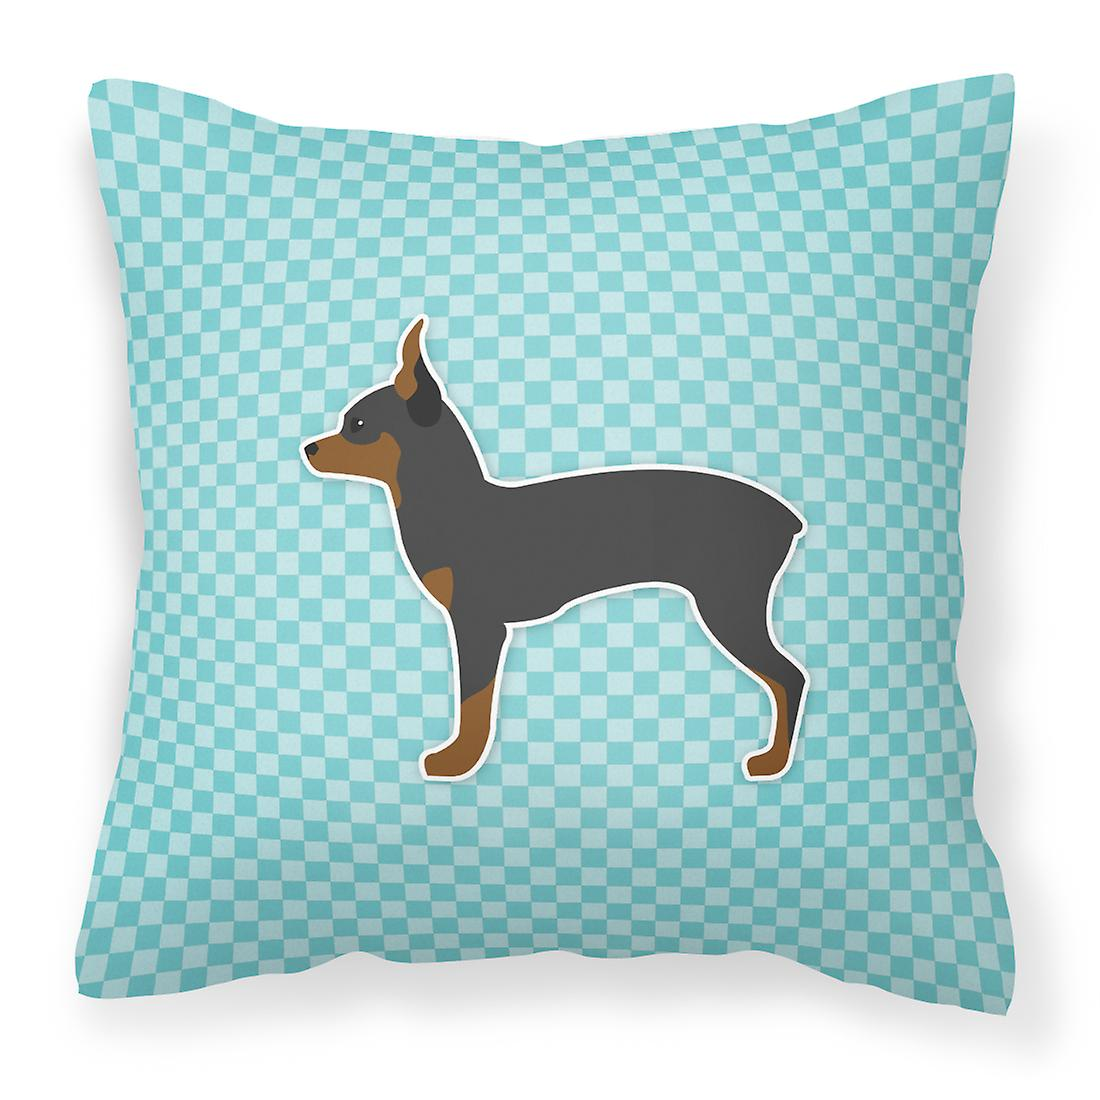 Tissu Fox Terrier Toy Damier Bleu Oreiller Décoratif OPknX80w